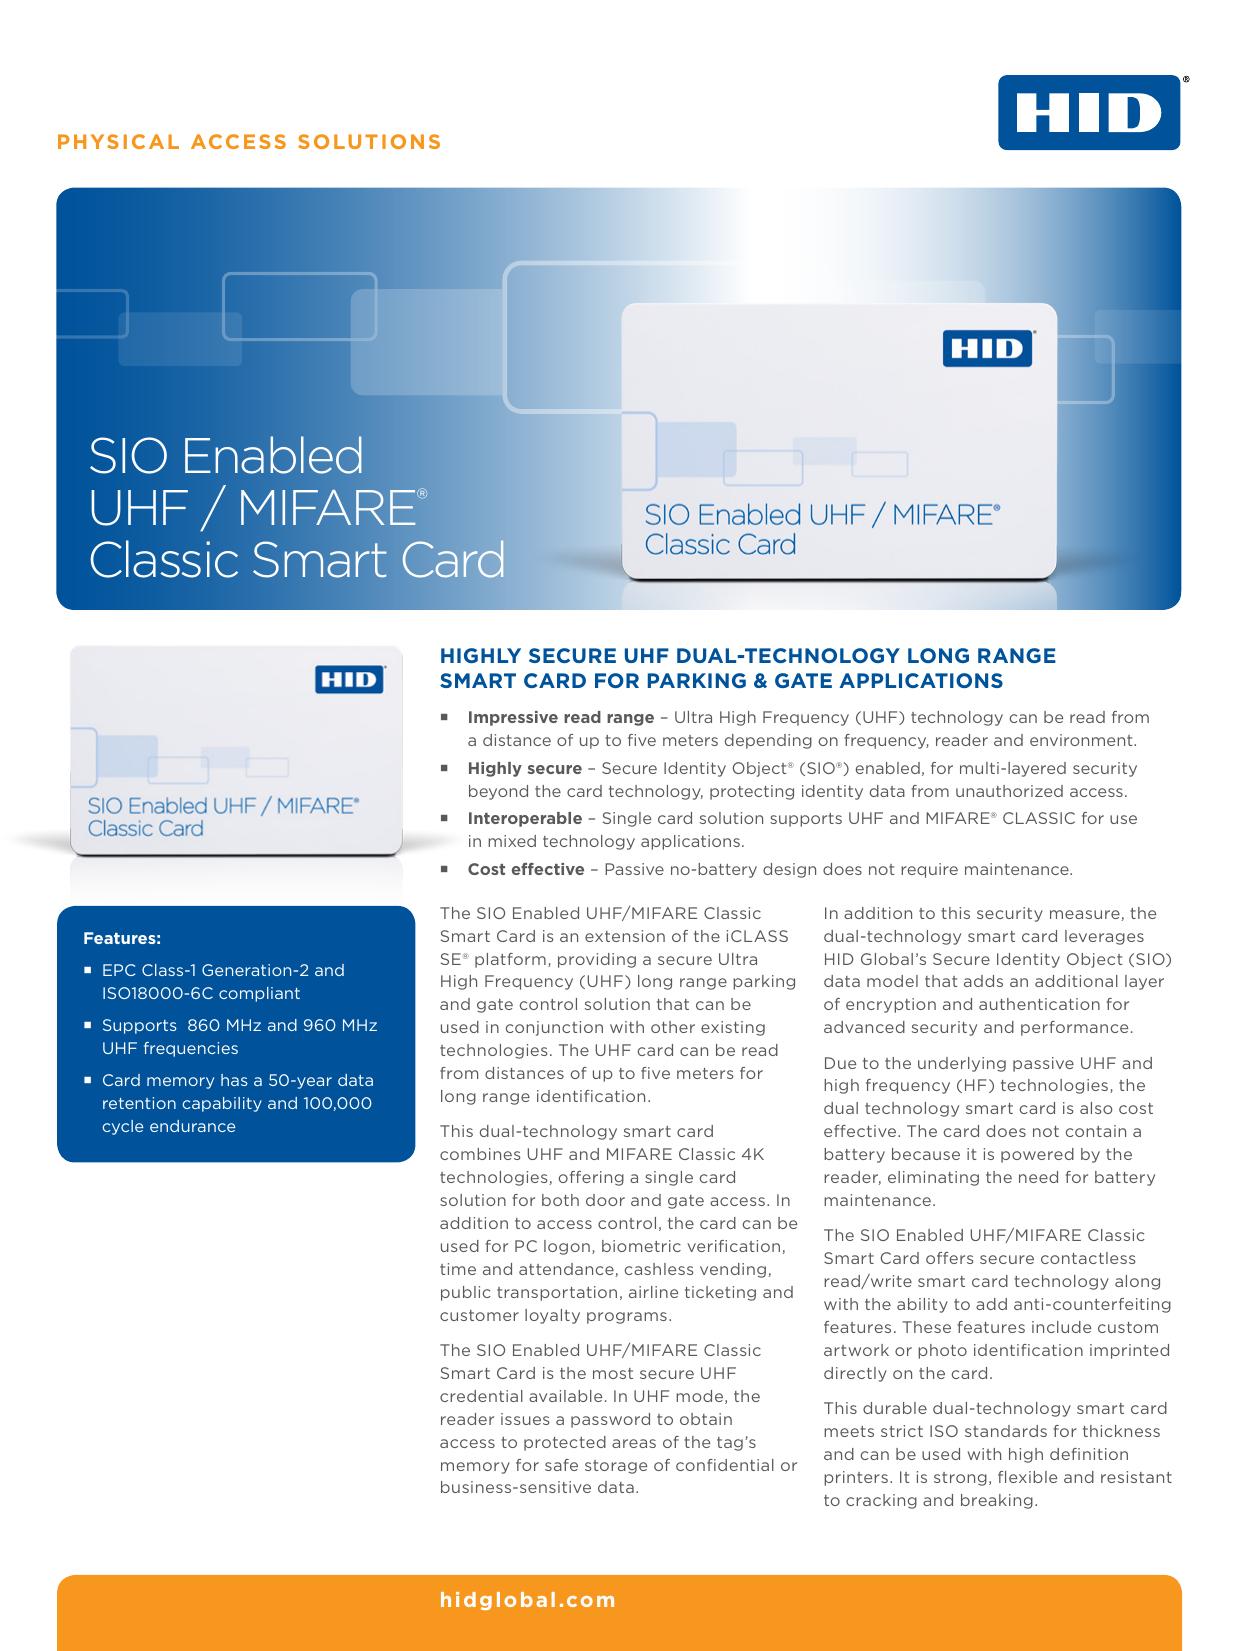 SIO Enabled UHF / MIFARE® Classic Smart Card   manualzz com